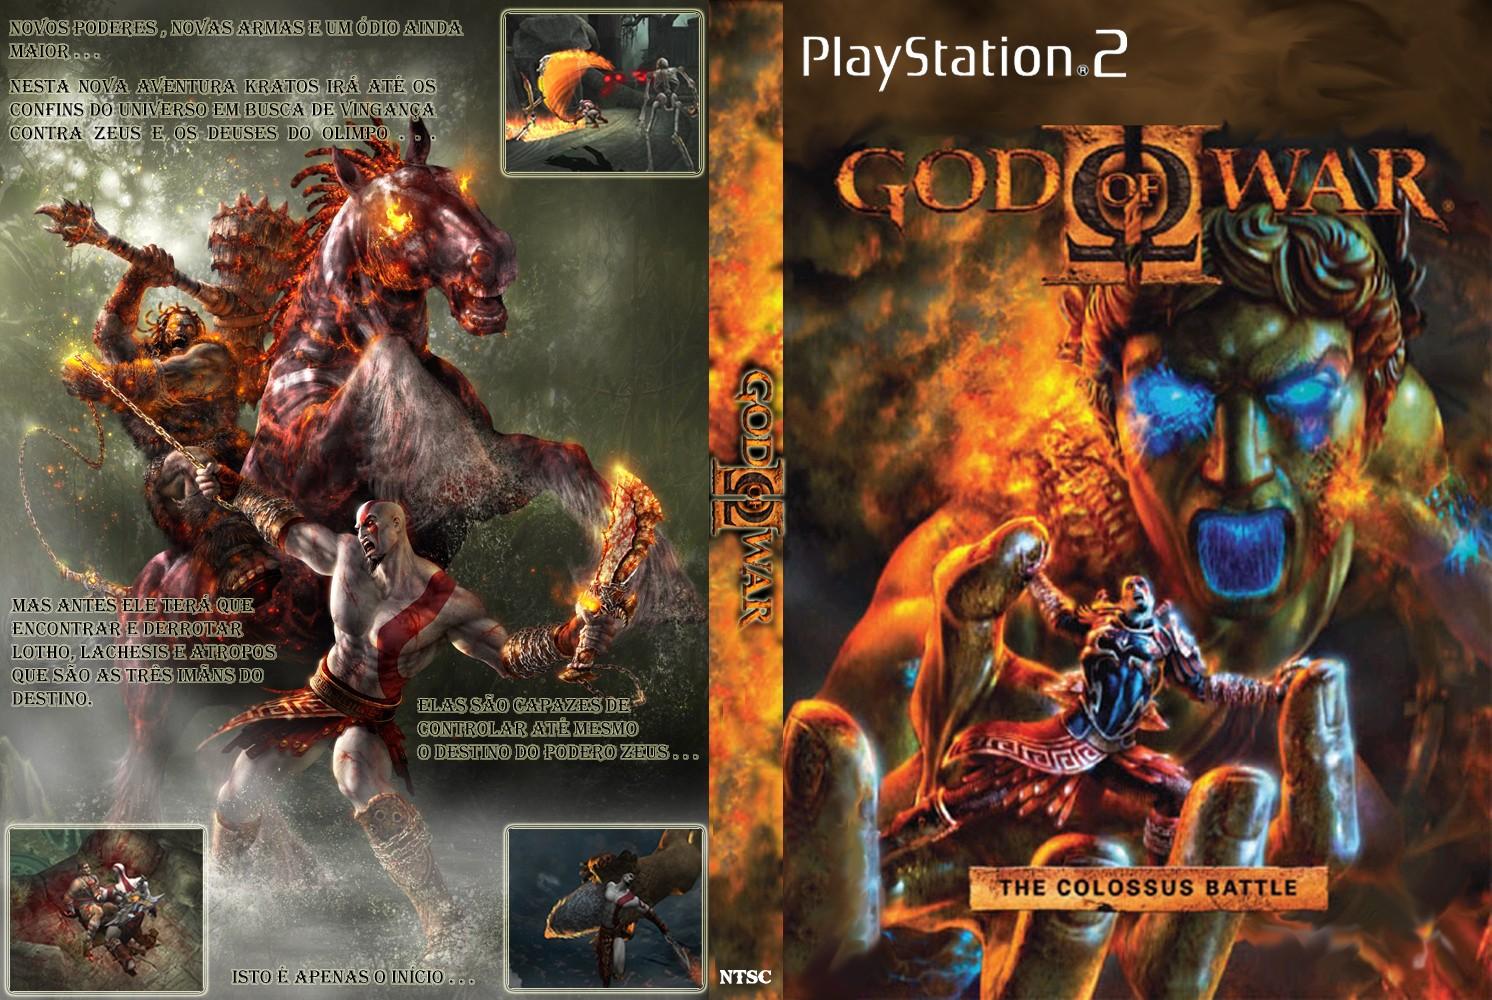 god of war 2 ps2 iso مضغوطة